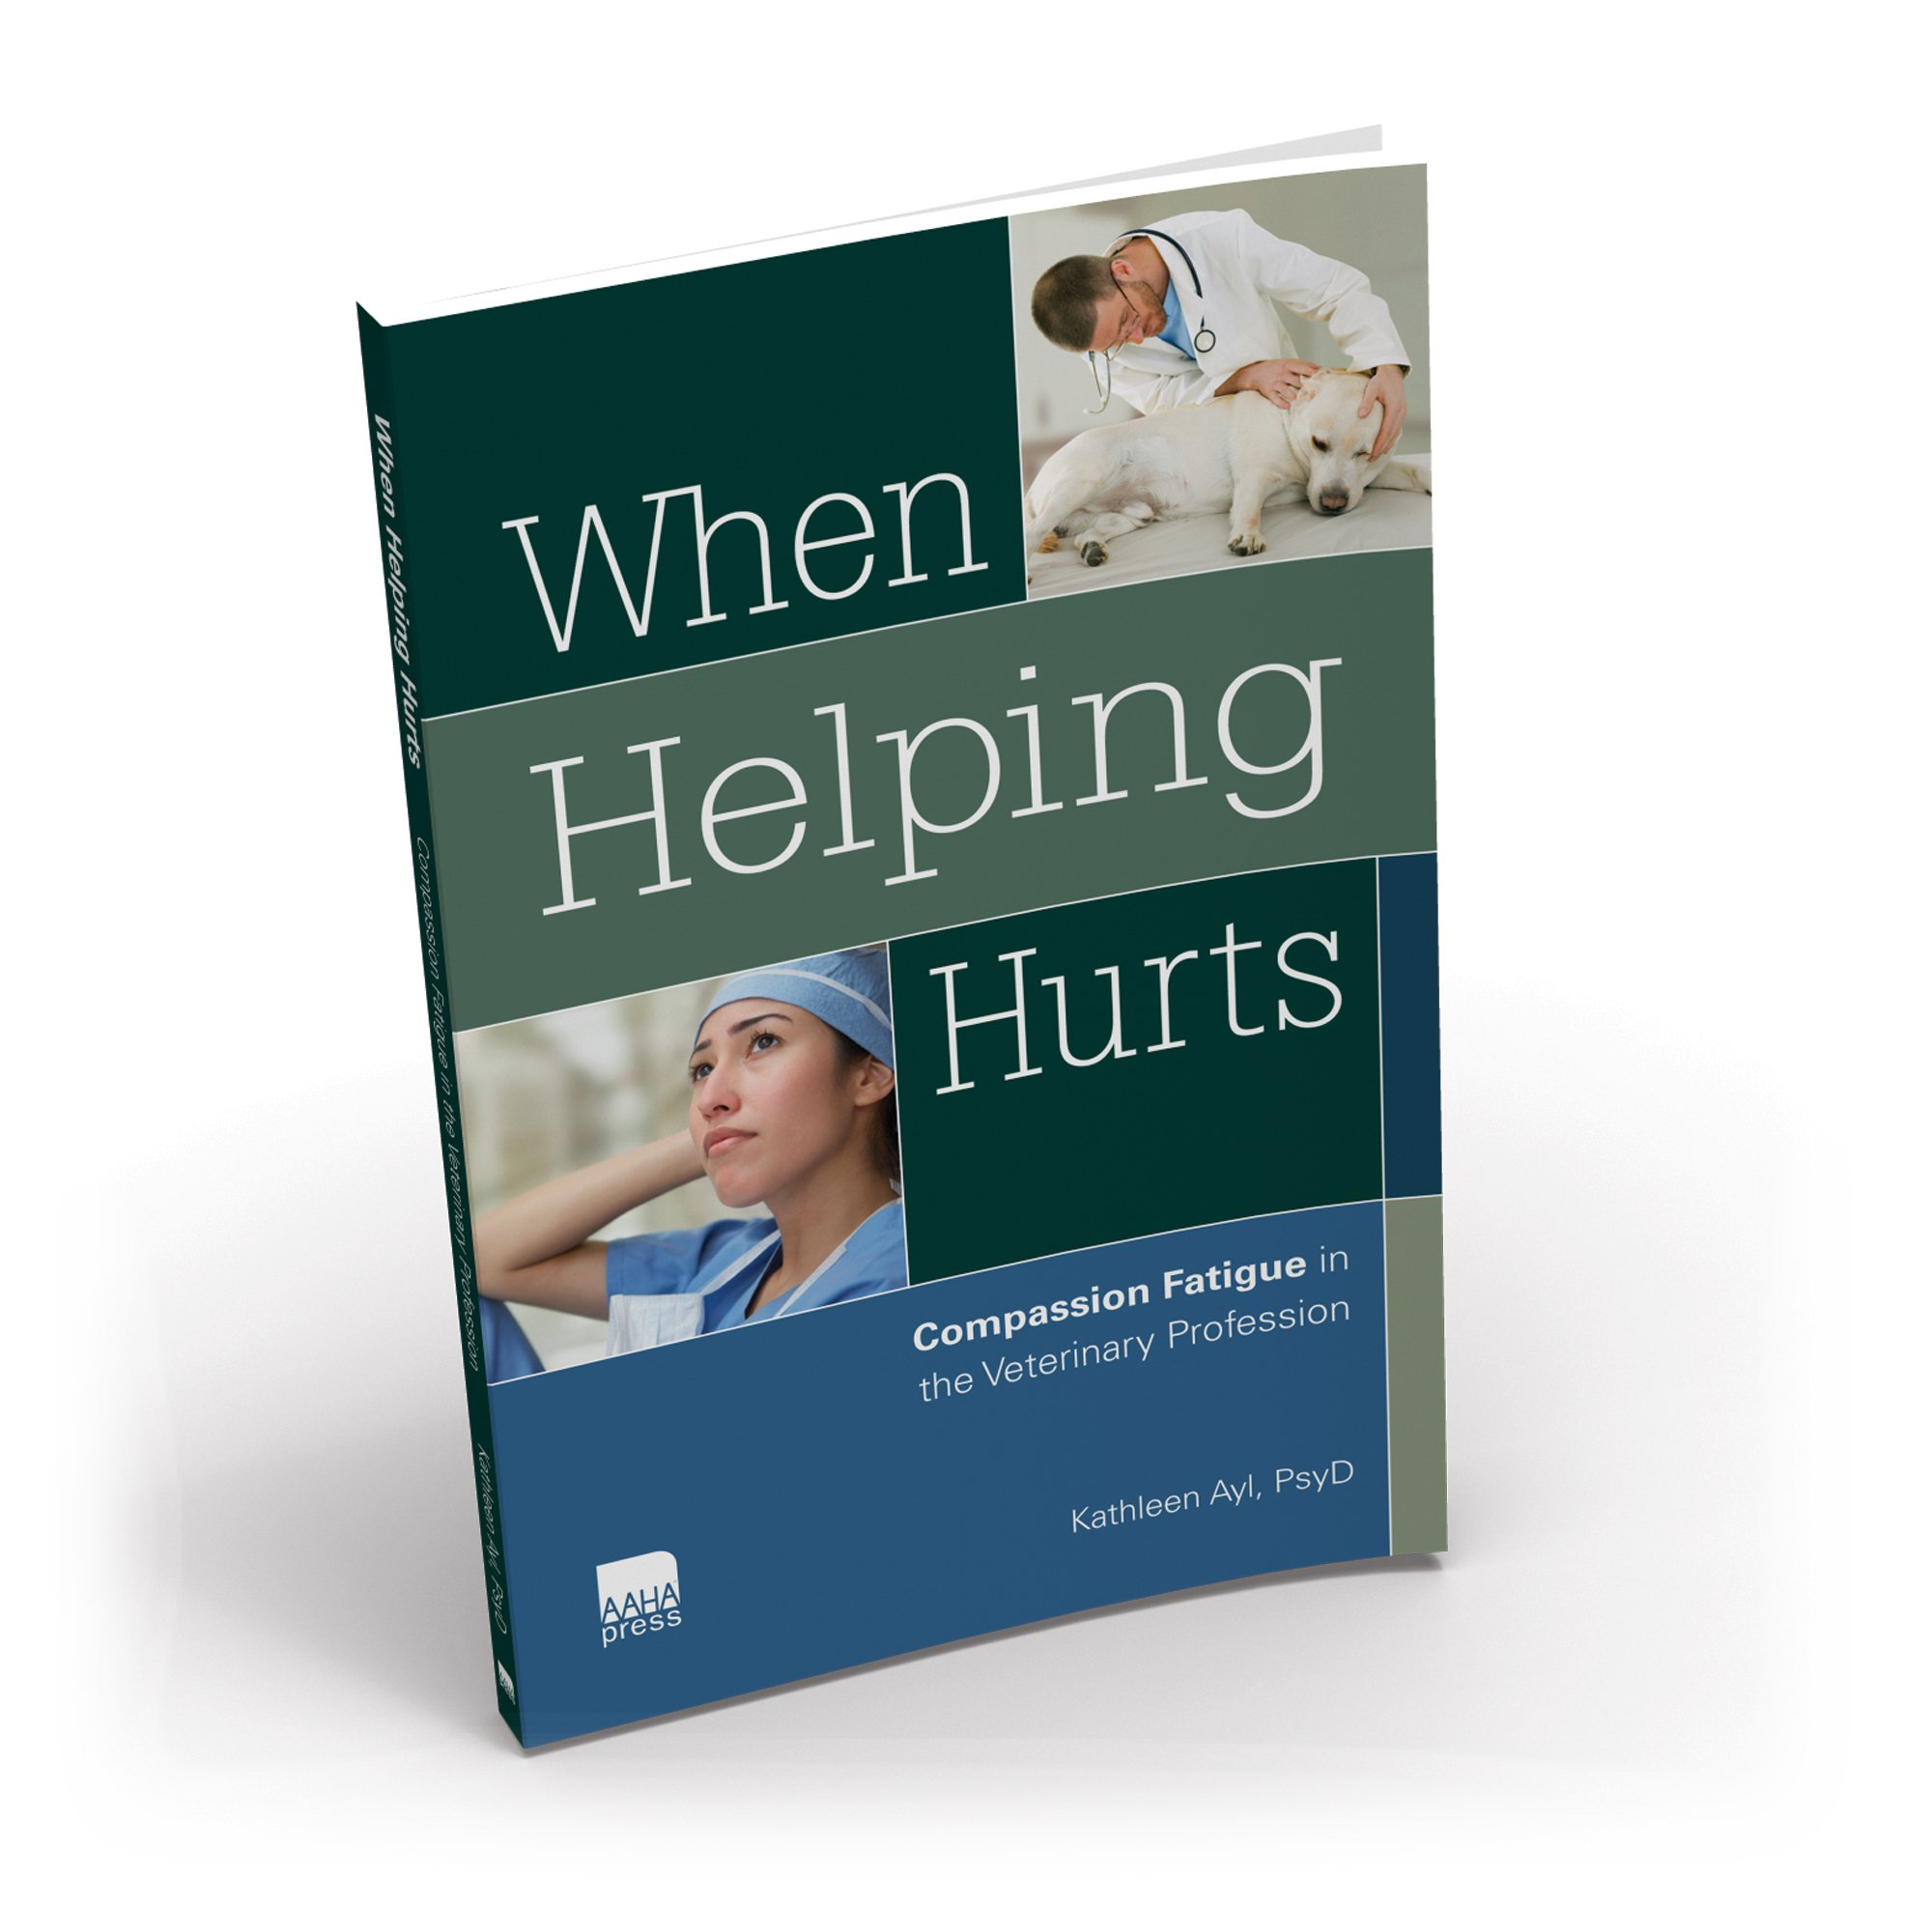 whenhelping hurts.jpg